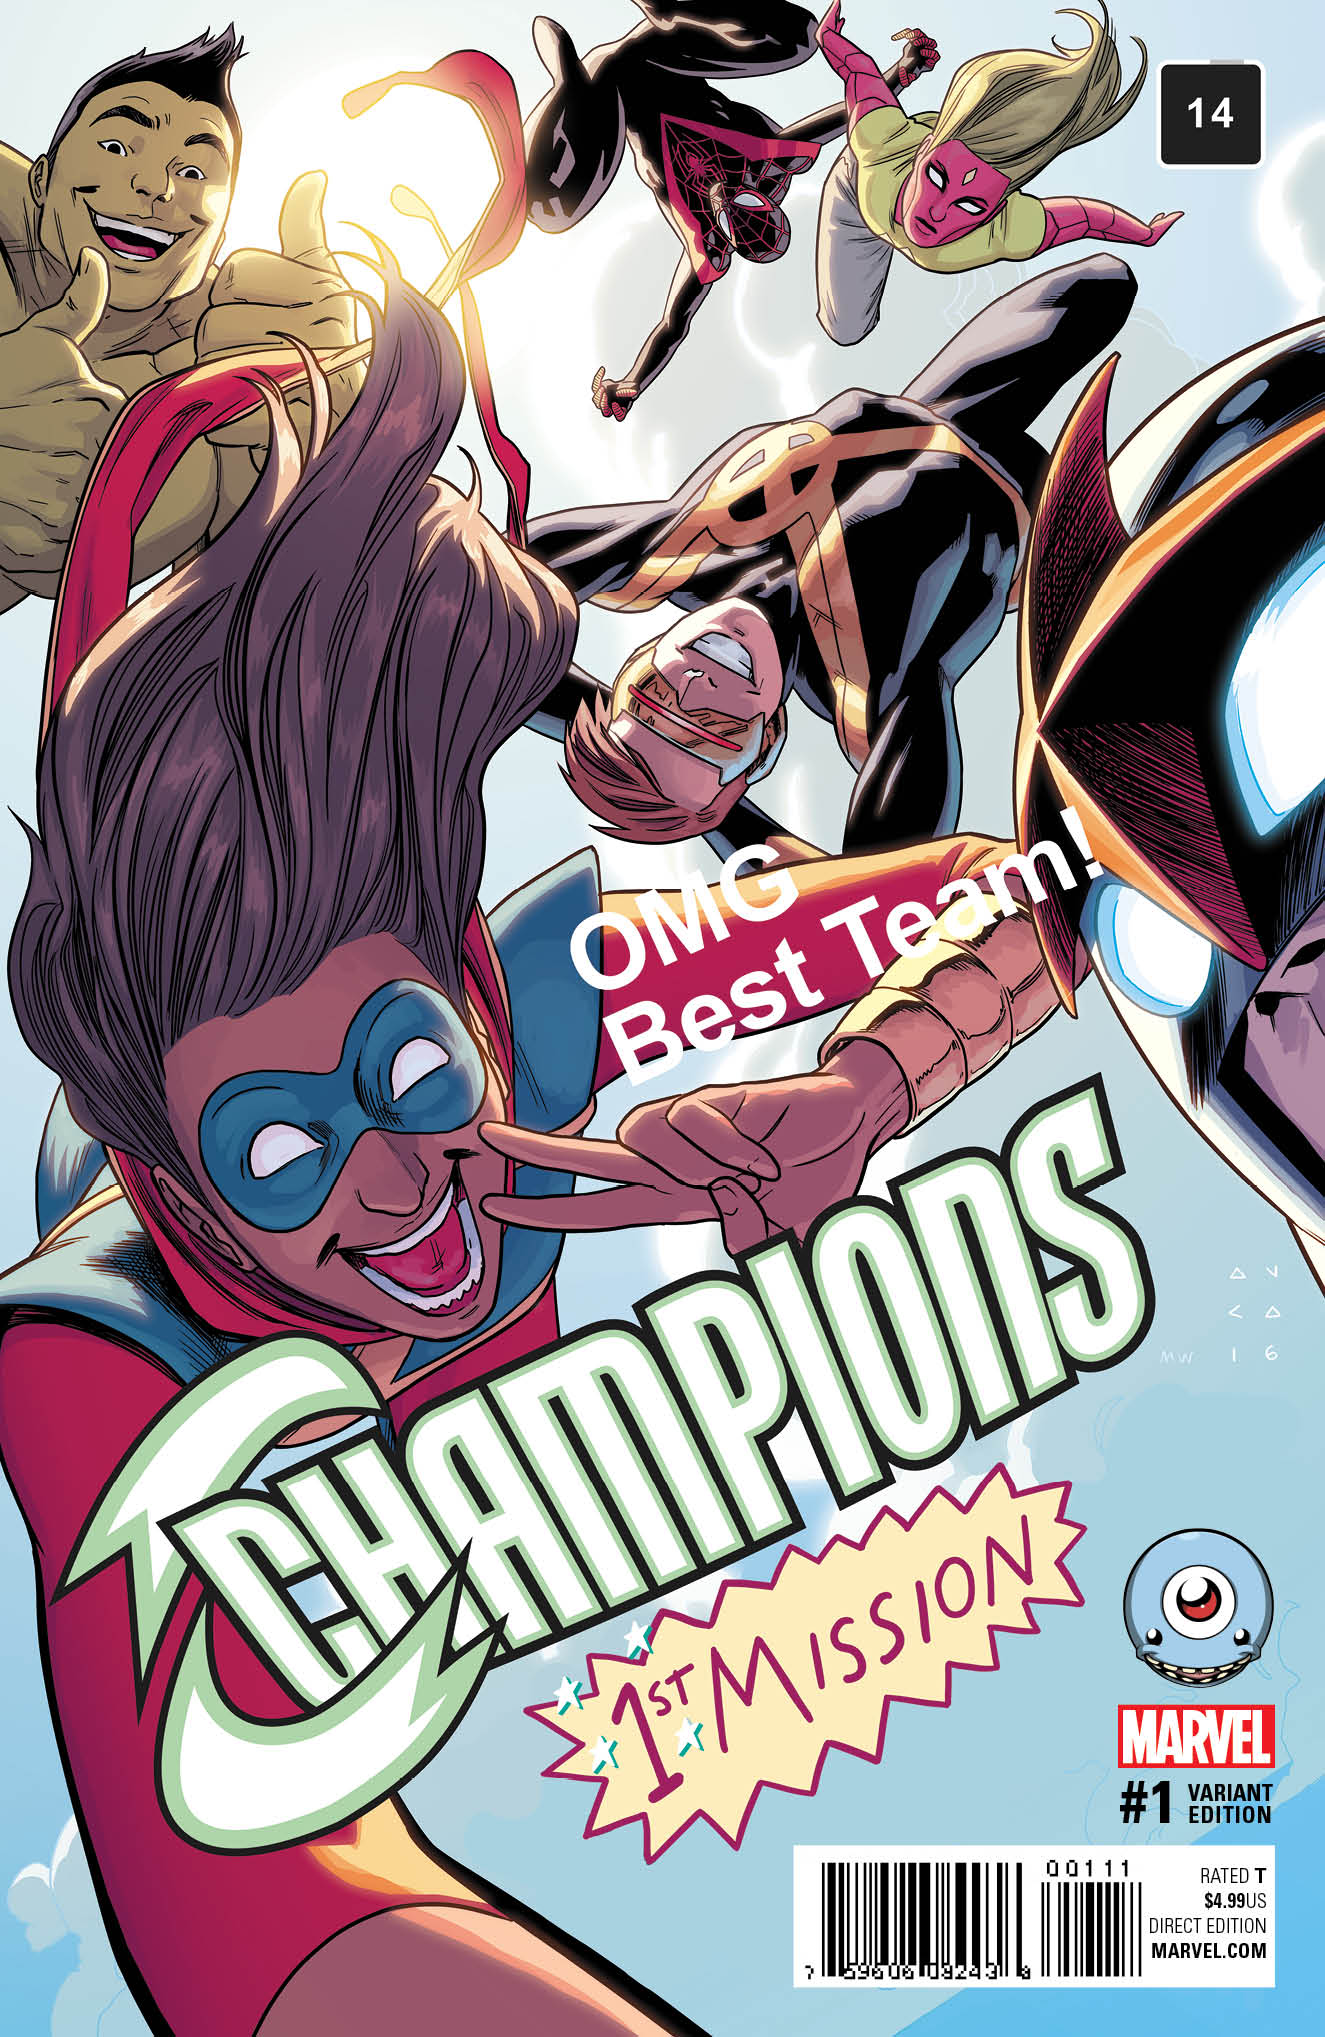 Champions Vol 2 1 Third Eye Comics Exclusive Variant.jpg